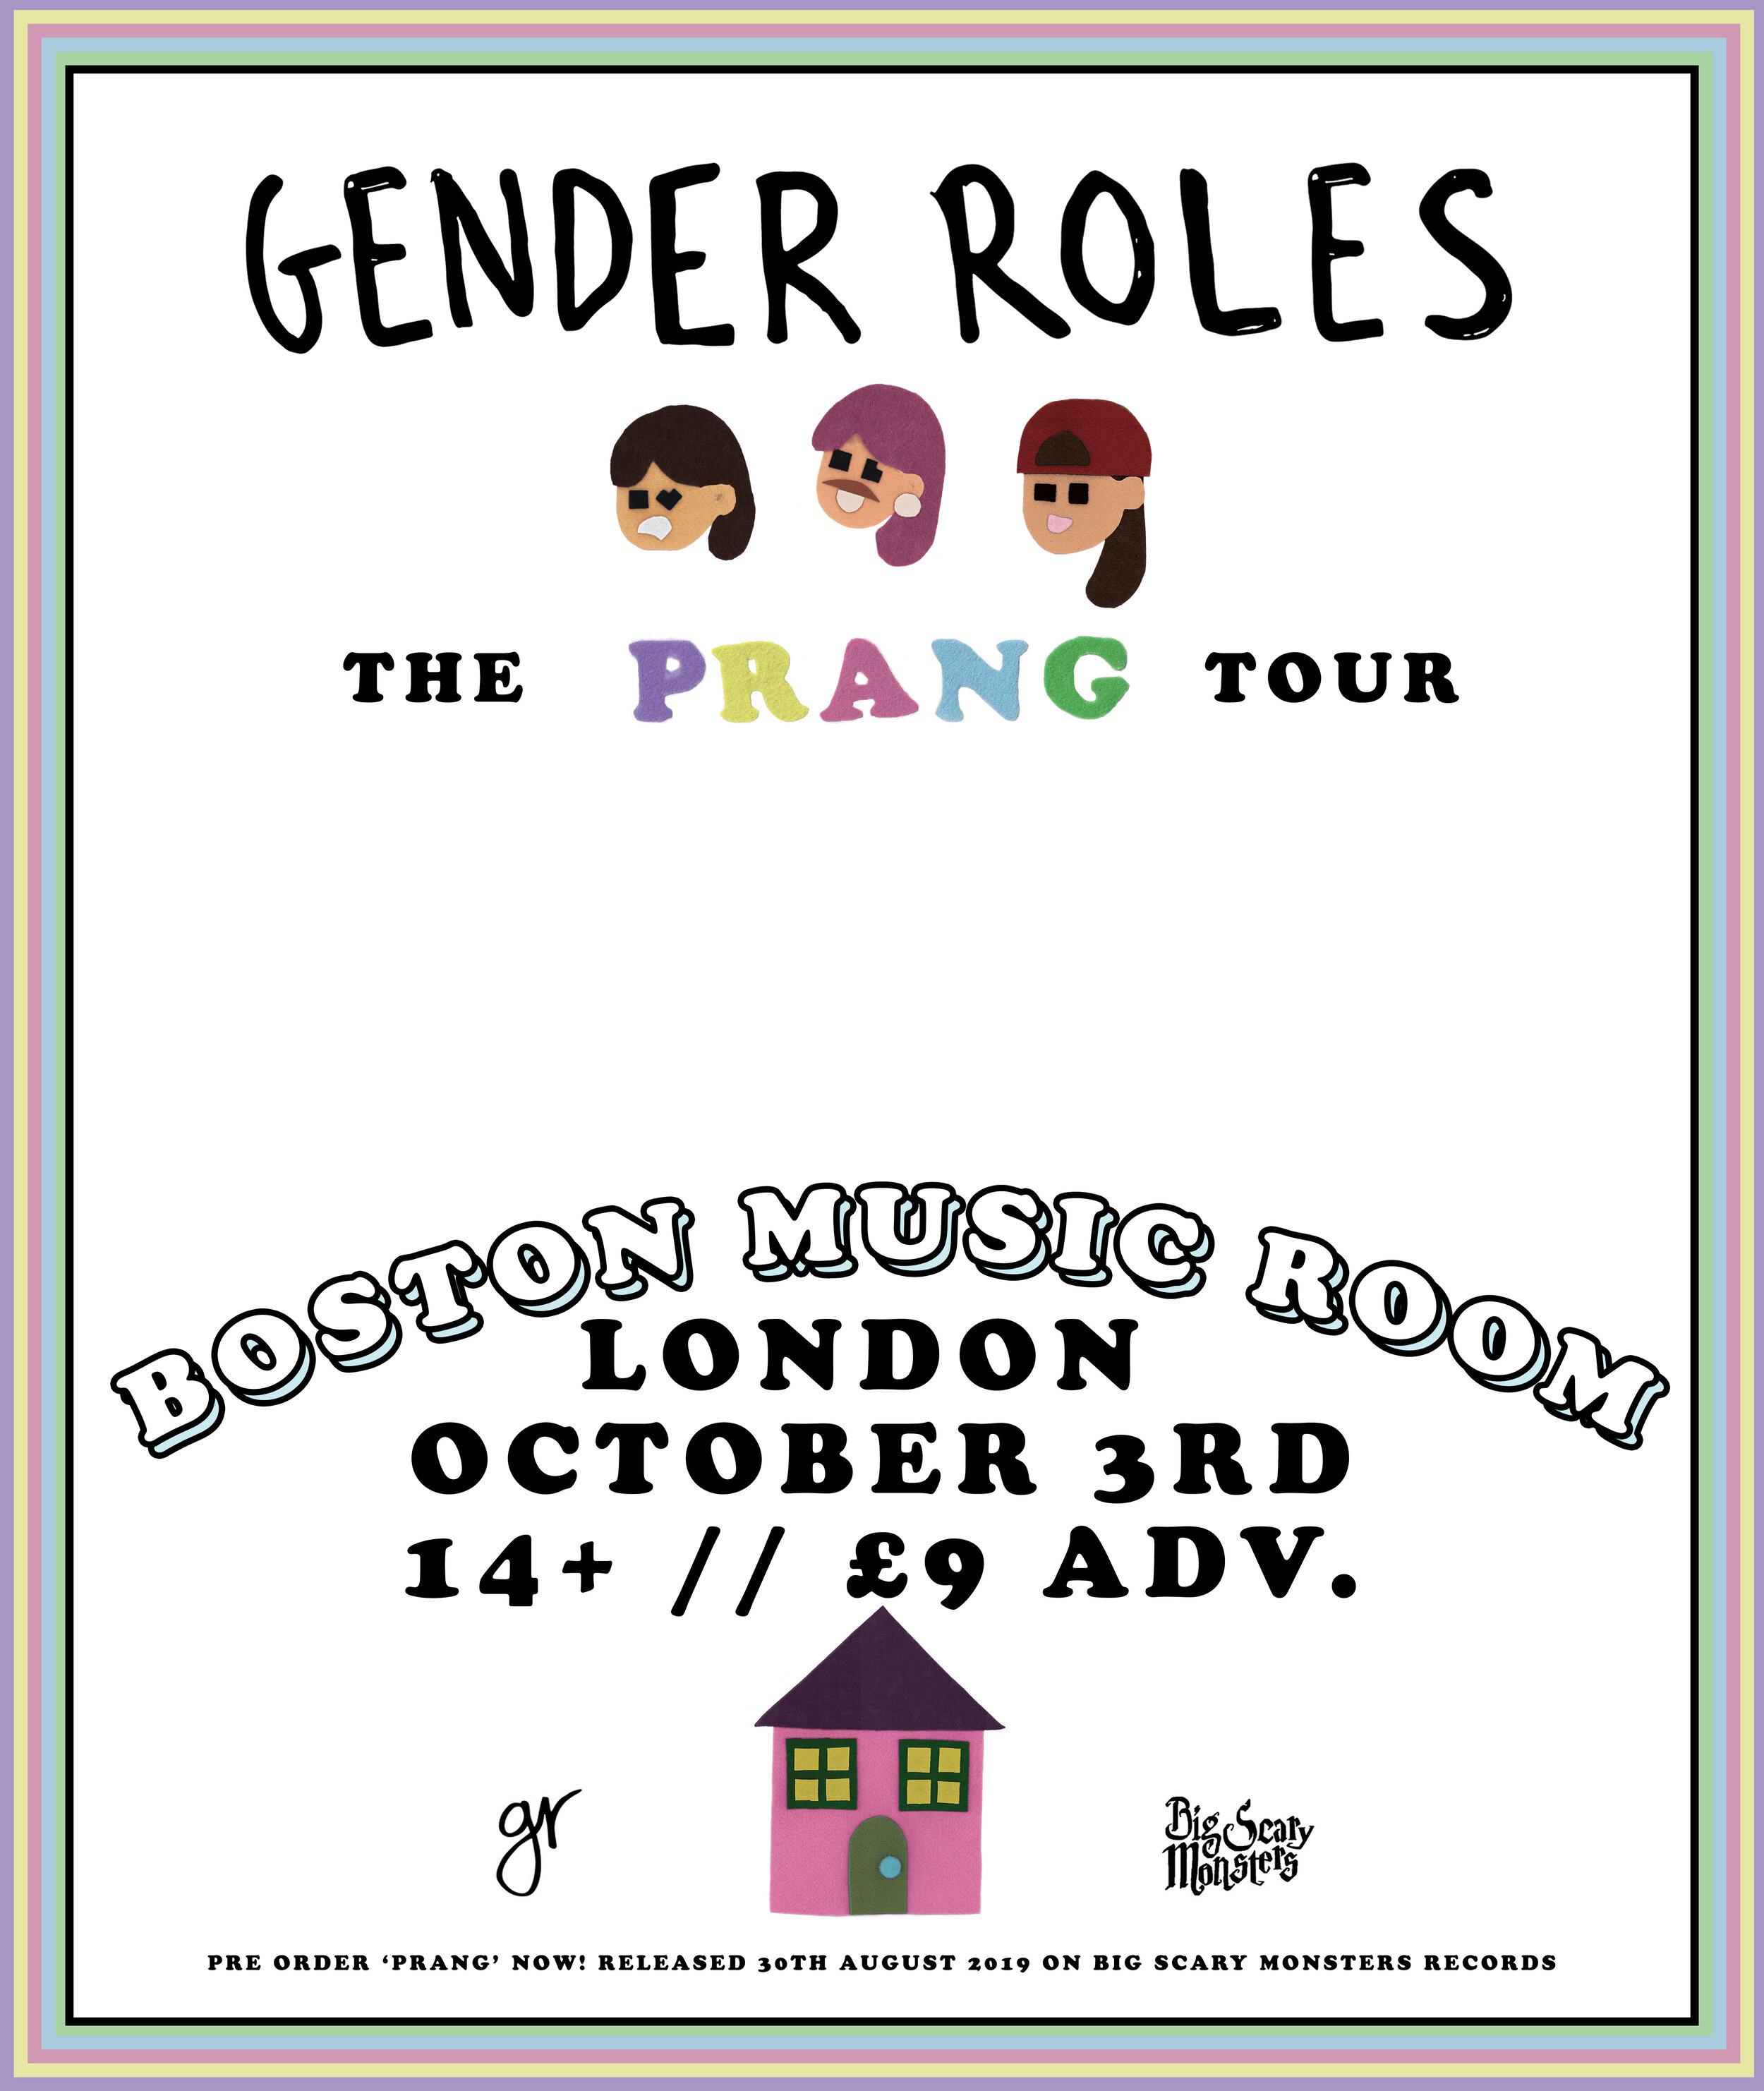 Gender Roles Boston Music Room 3 october.jpg